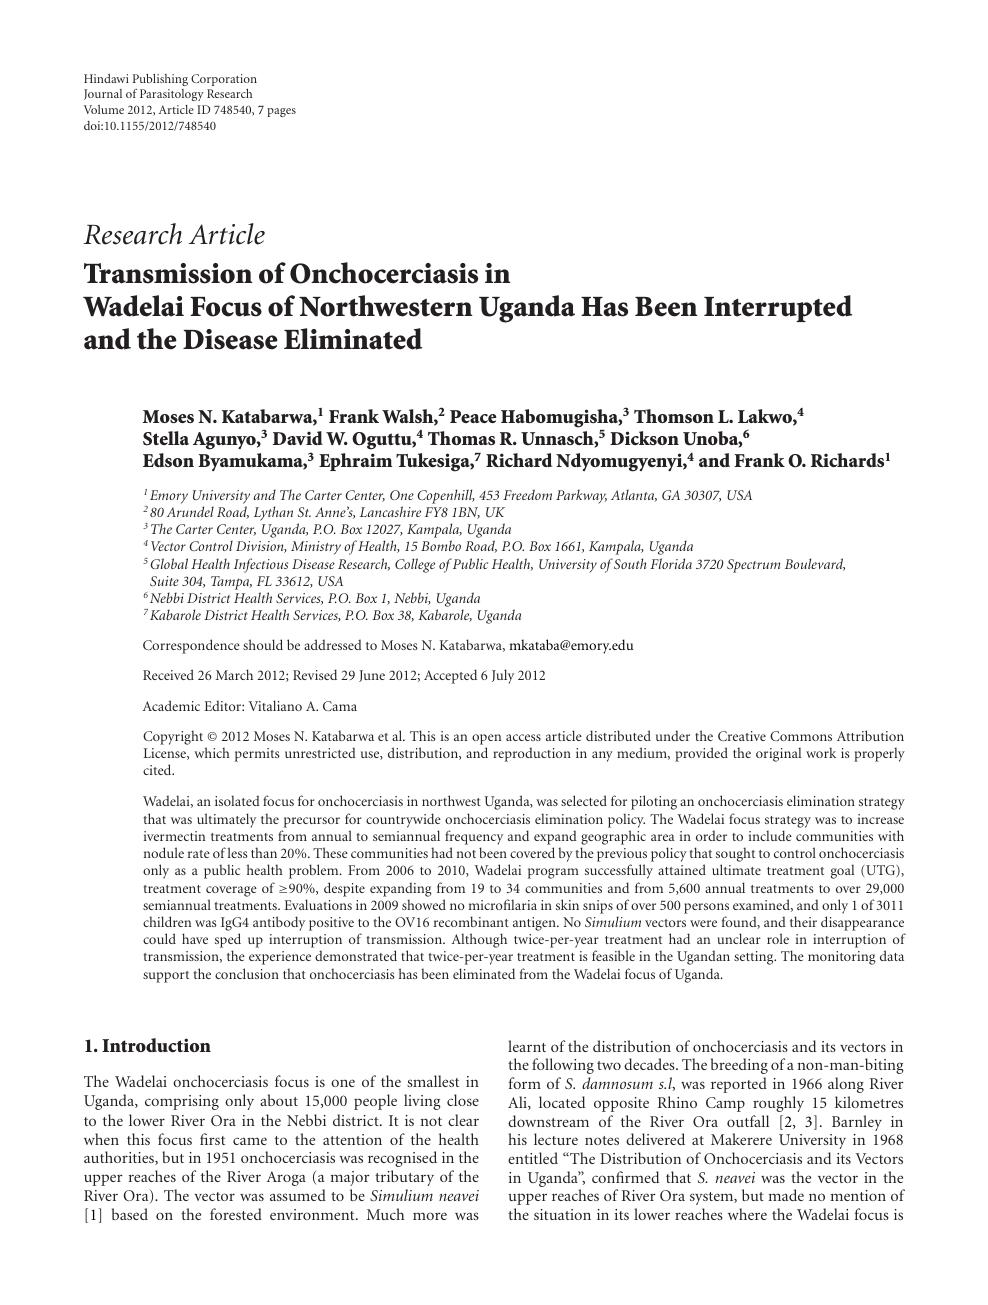 Transmission of Onchocerciasis in Wadelai Focus of